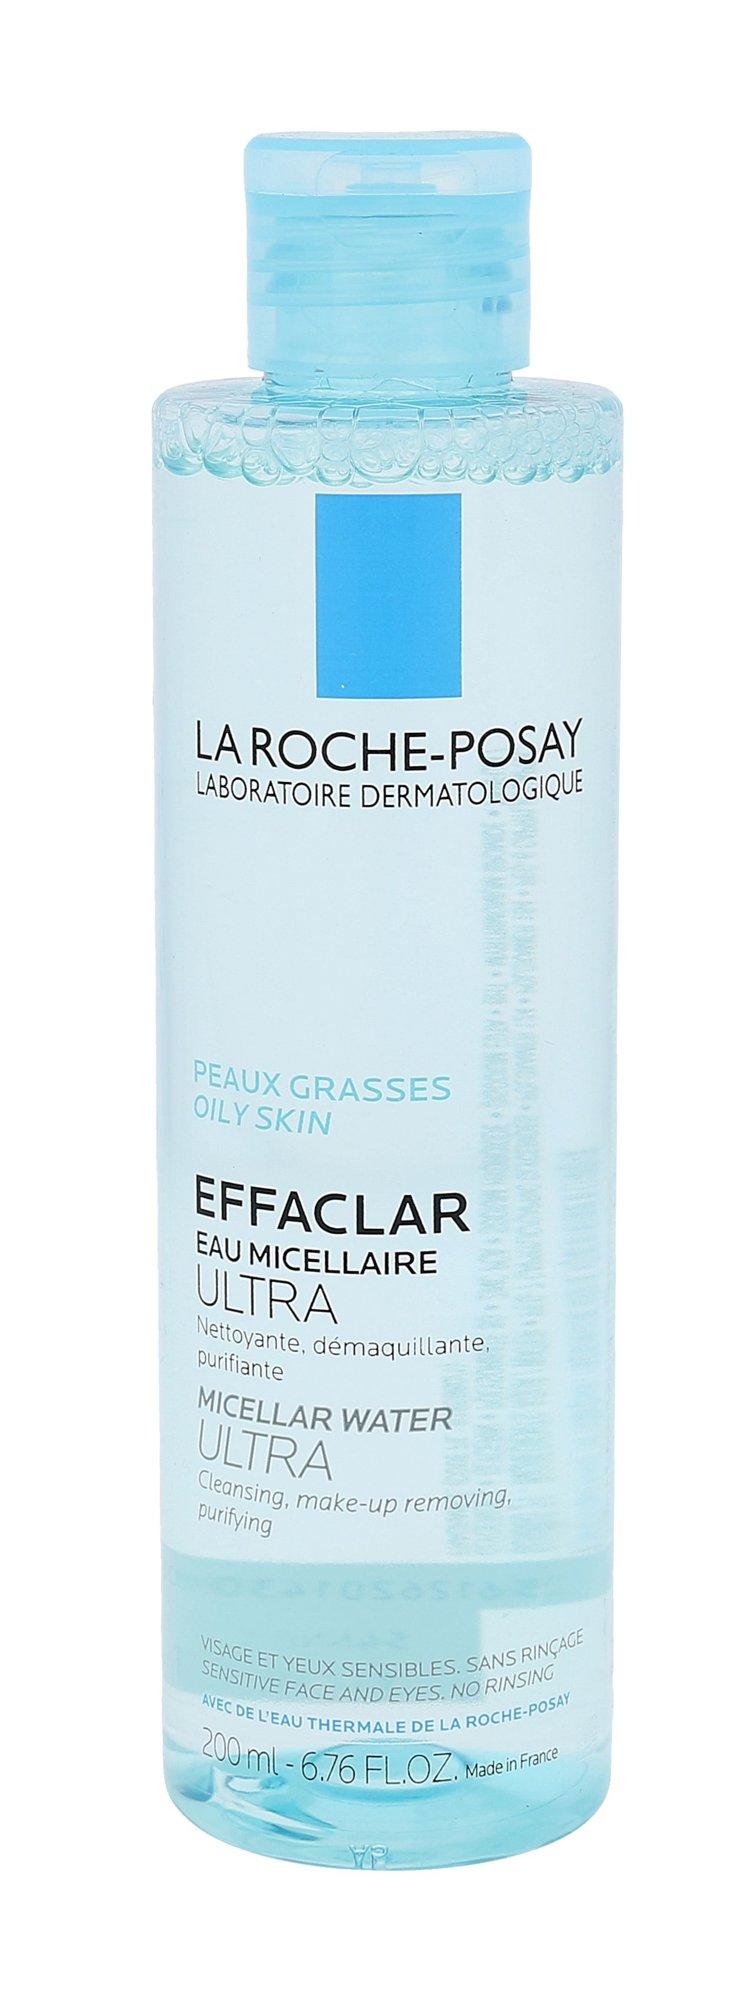 La Roche-Posay Effaclar Purifying Micellar Water